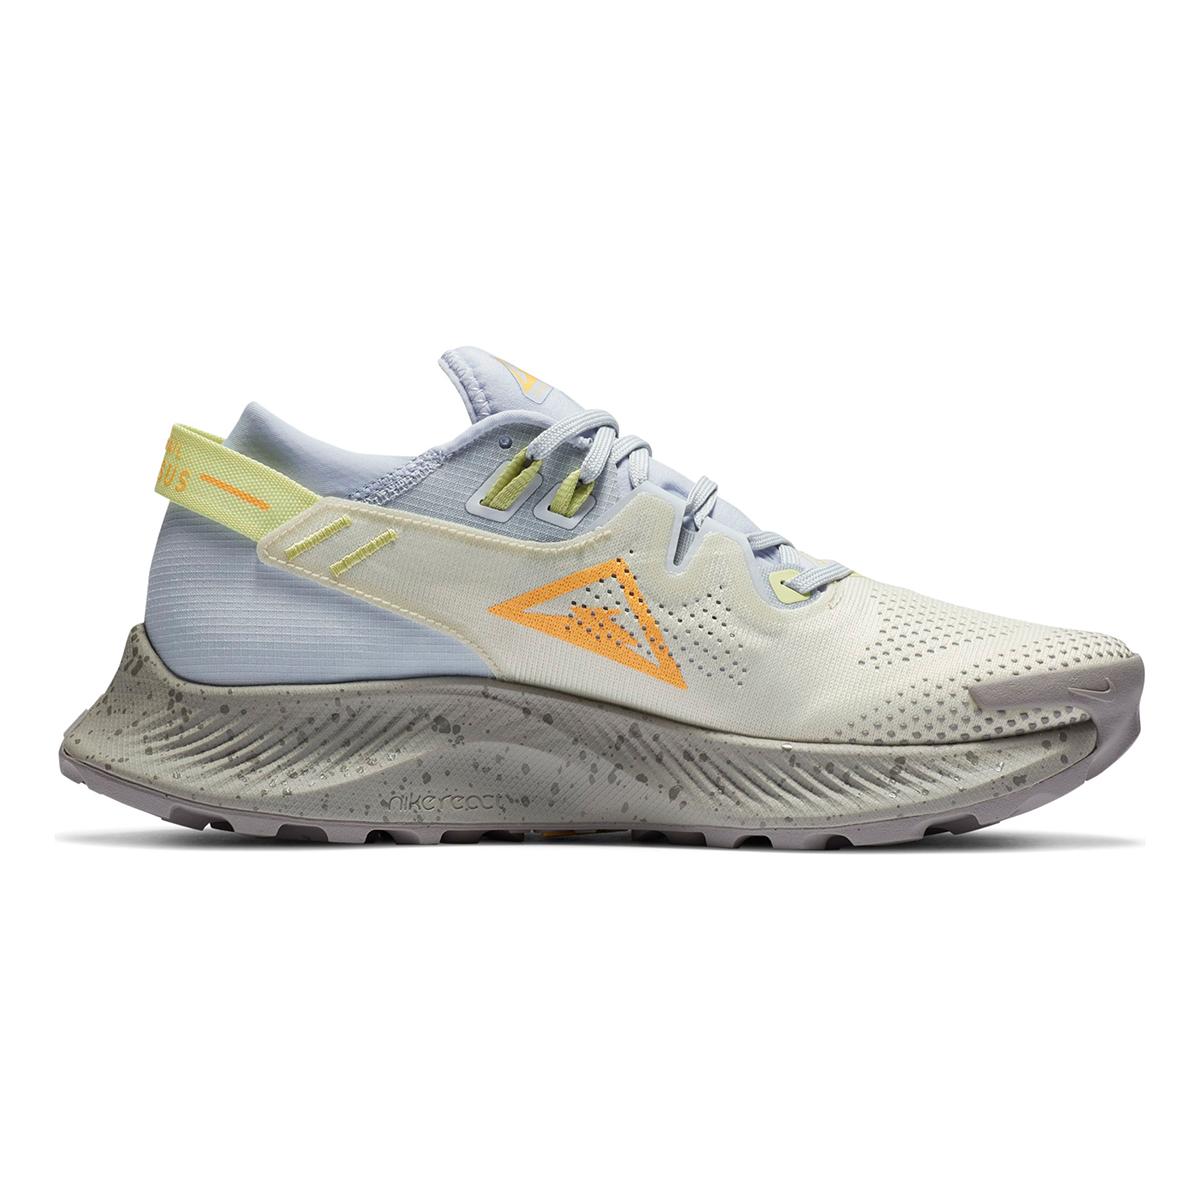 Women's Nike Pegasus Trail 2 Trail Running Shoe - Color: Pure Platinum/Fossil/Limelight/Laser Orange - Size: 5 - Width: Regular, Pure Platinum/Fossil/Limelight/Laser Orange, large, image 2